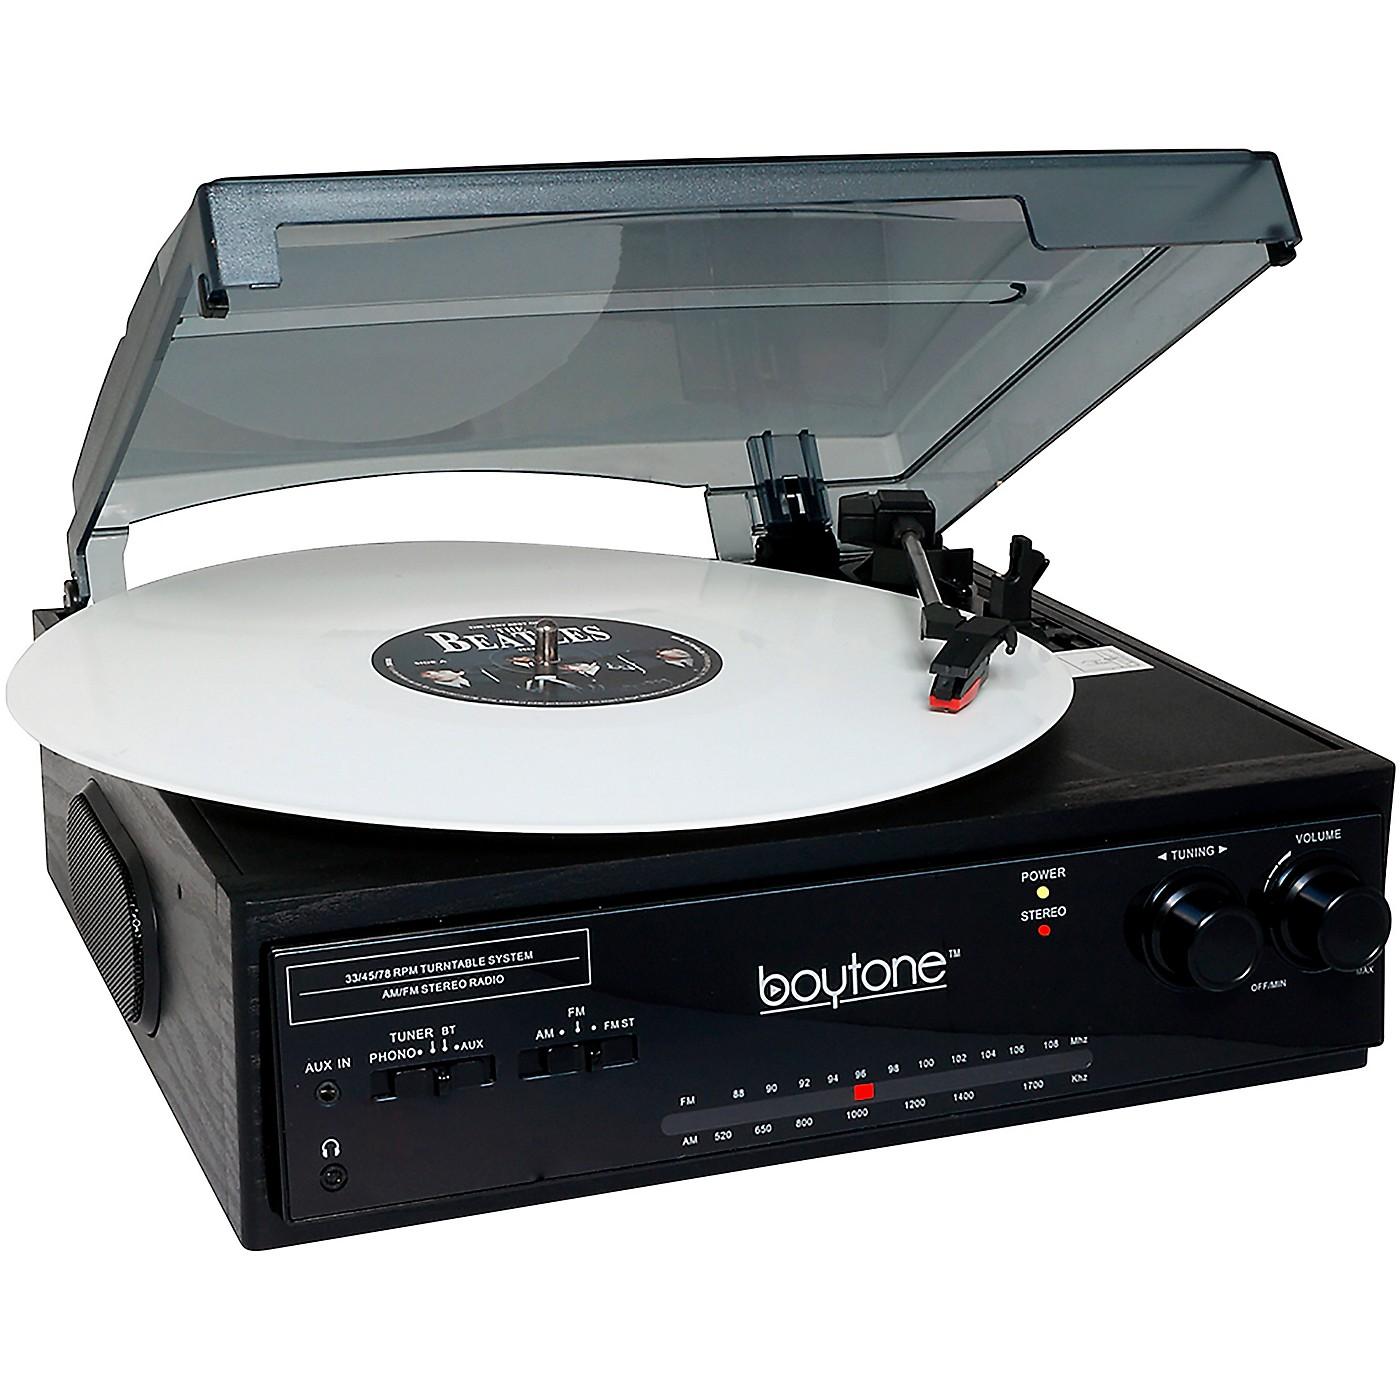 Boytone BT-13B Multimedia Audio System With Bluetooth thumbnail